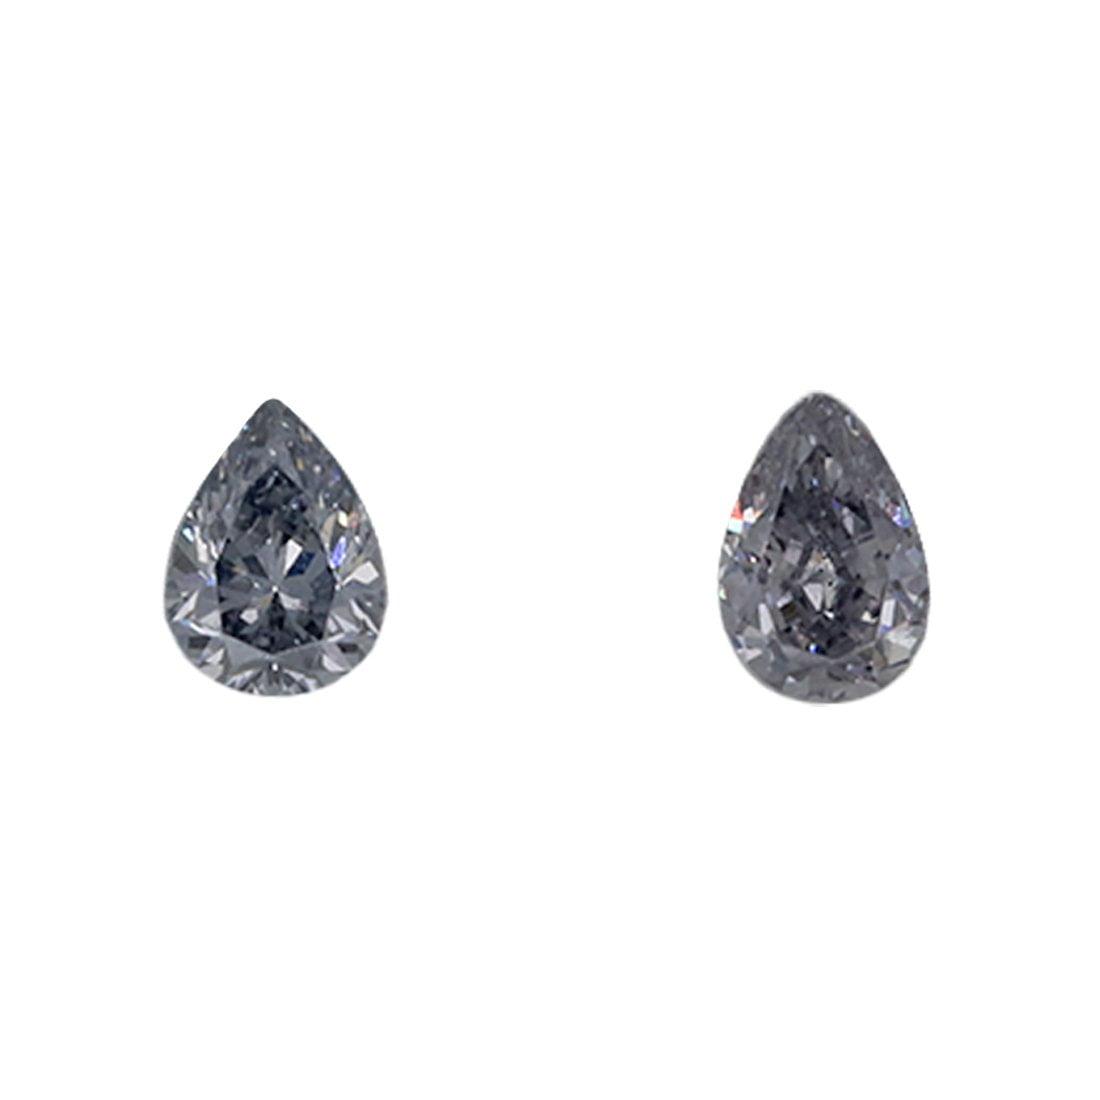 2=0.16ct Natural Fancy Light Bluish Grey, BL1, VS2, Argyle Pink Diamond